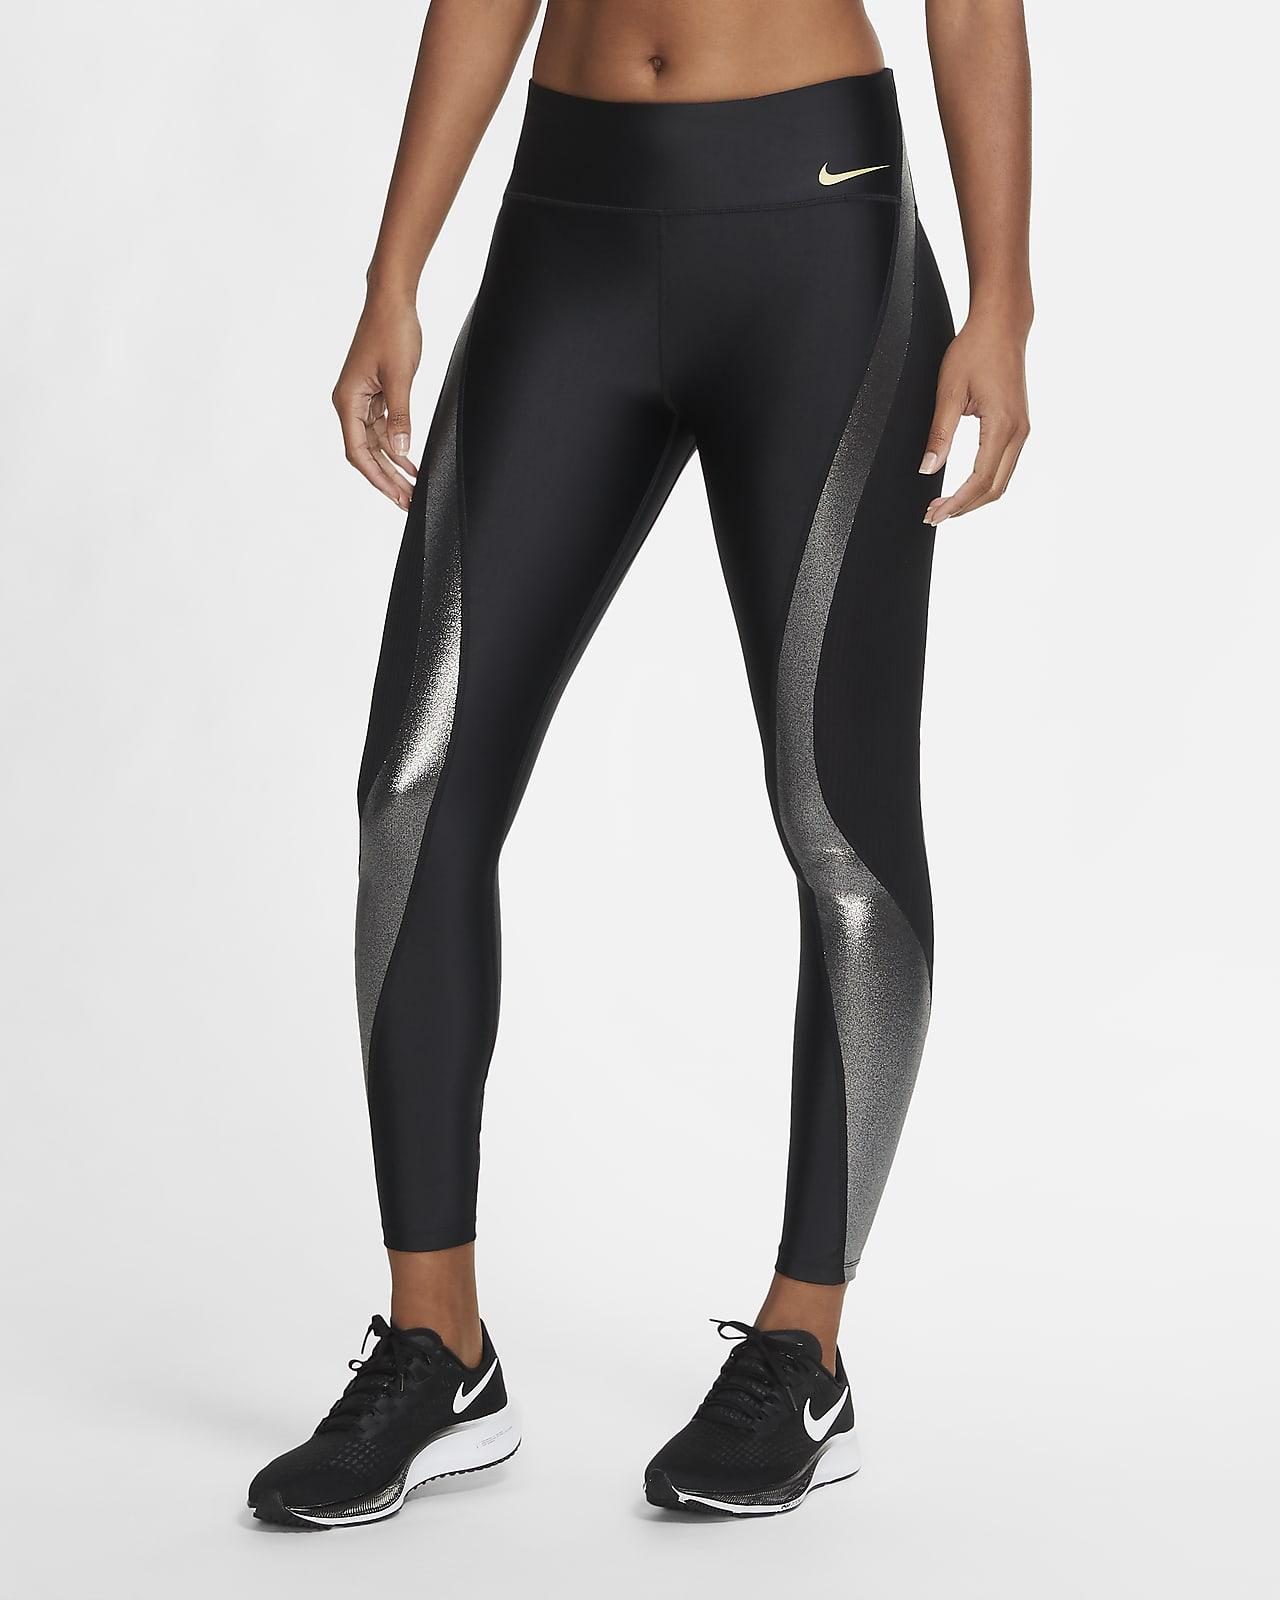 Nike Icon Clash Speed Women's 7/8 Running Tights